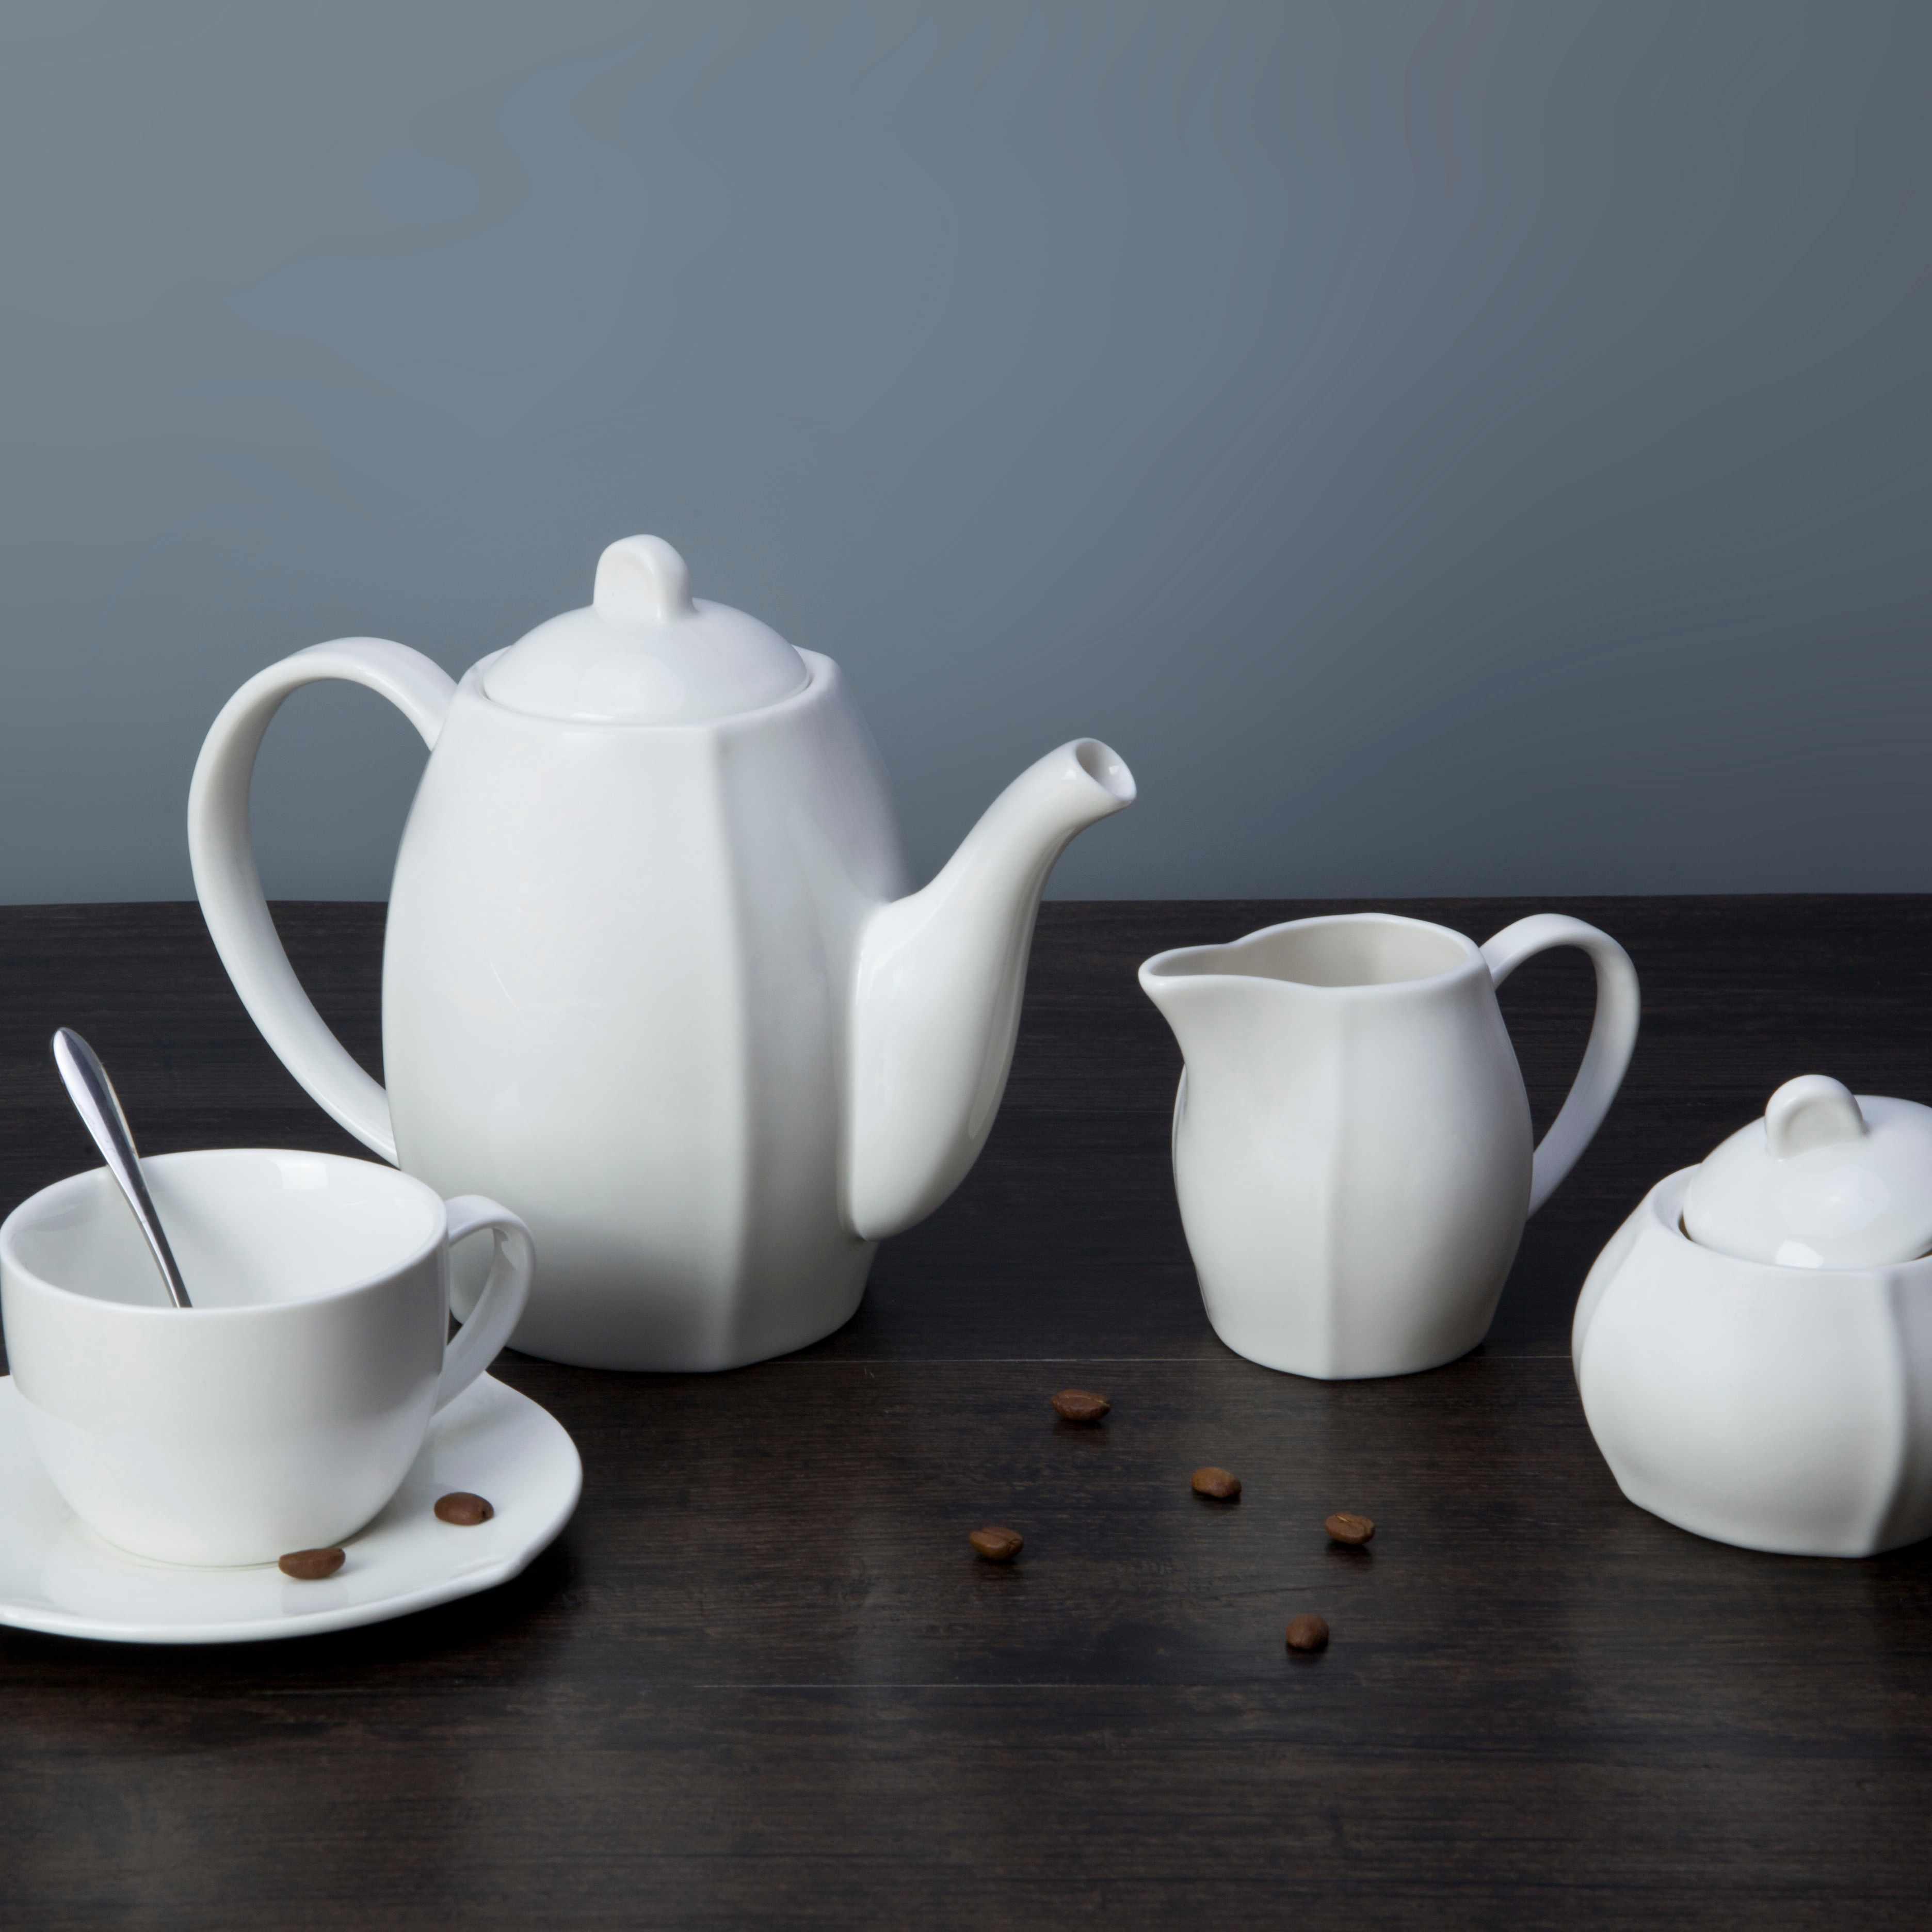 Two Eight-9 piece restaurant modern white porcelain dinnerware - TW25-1